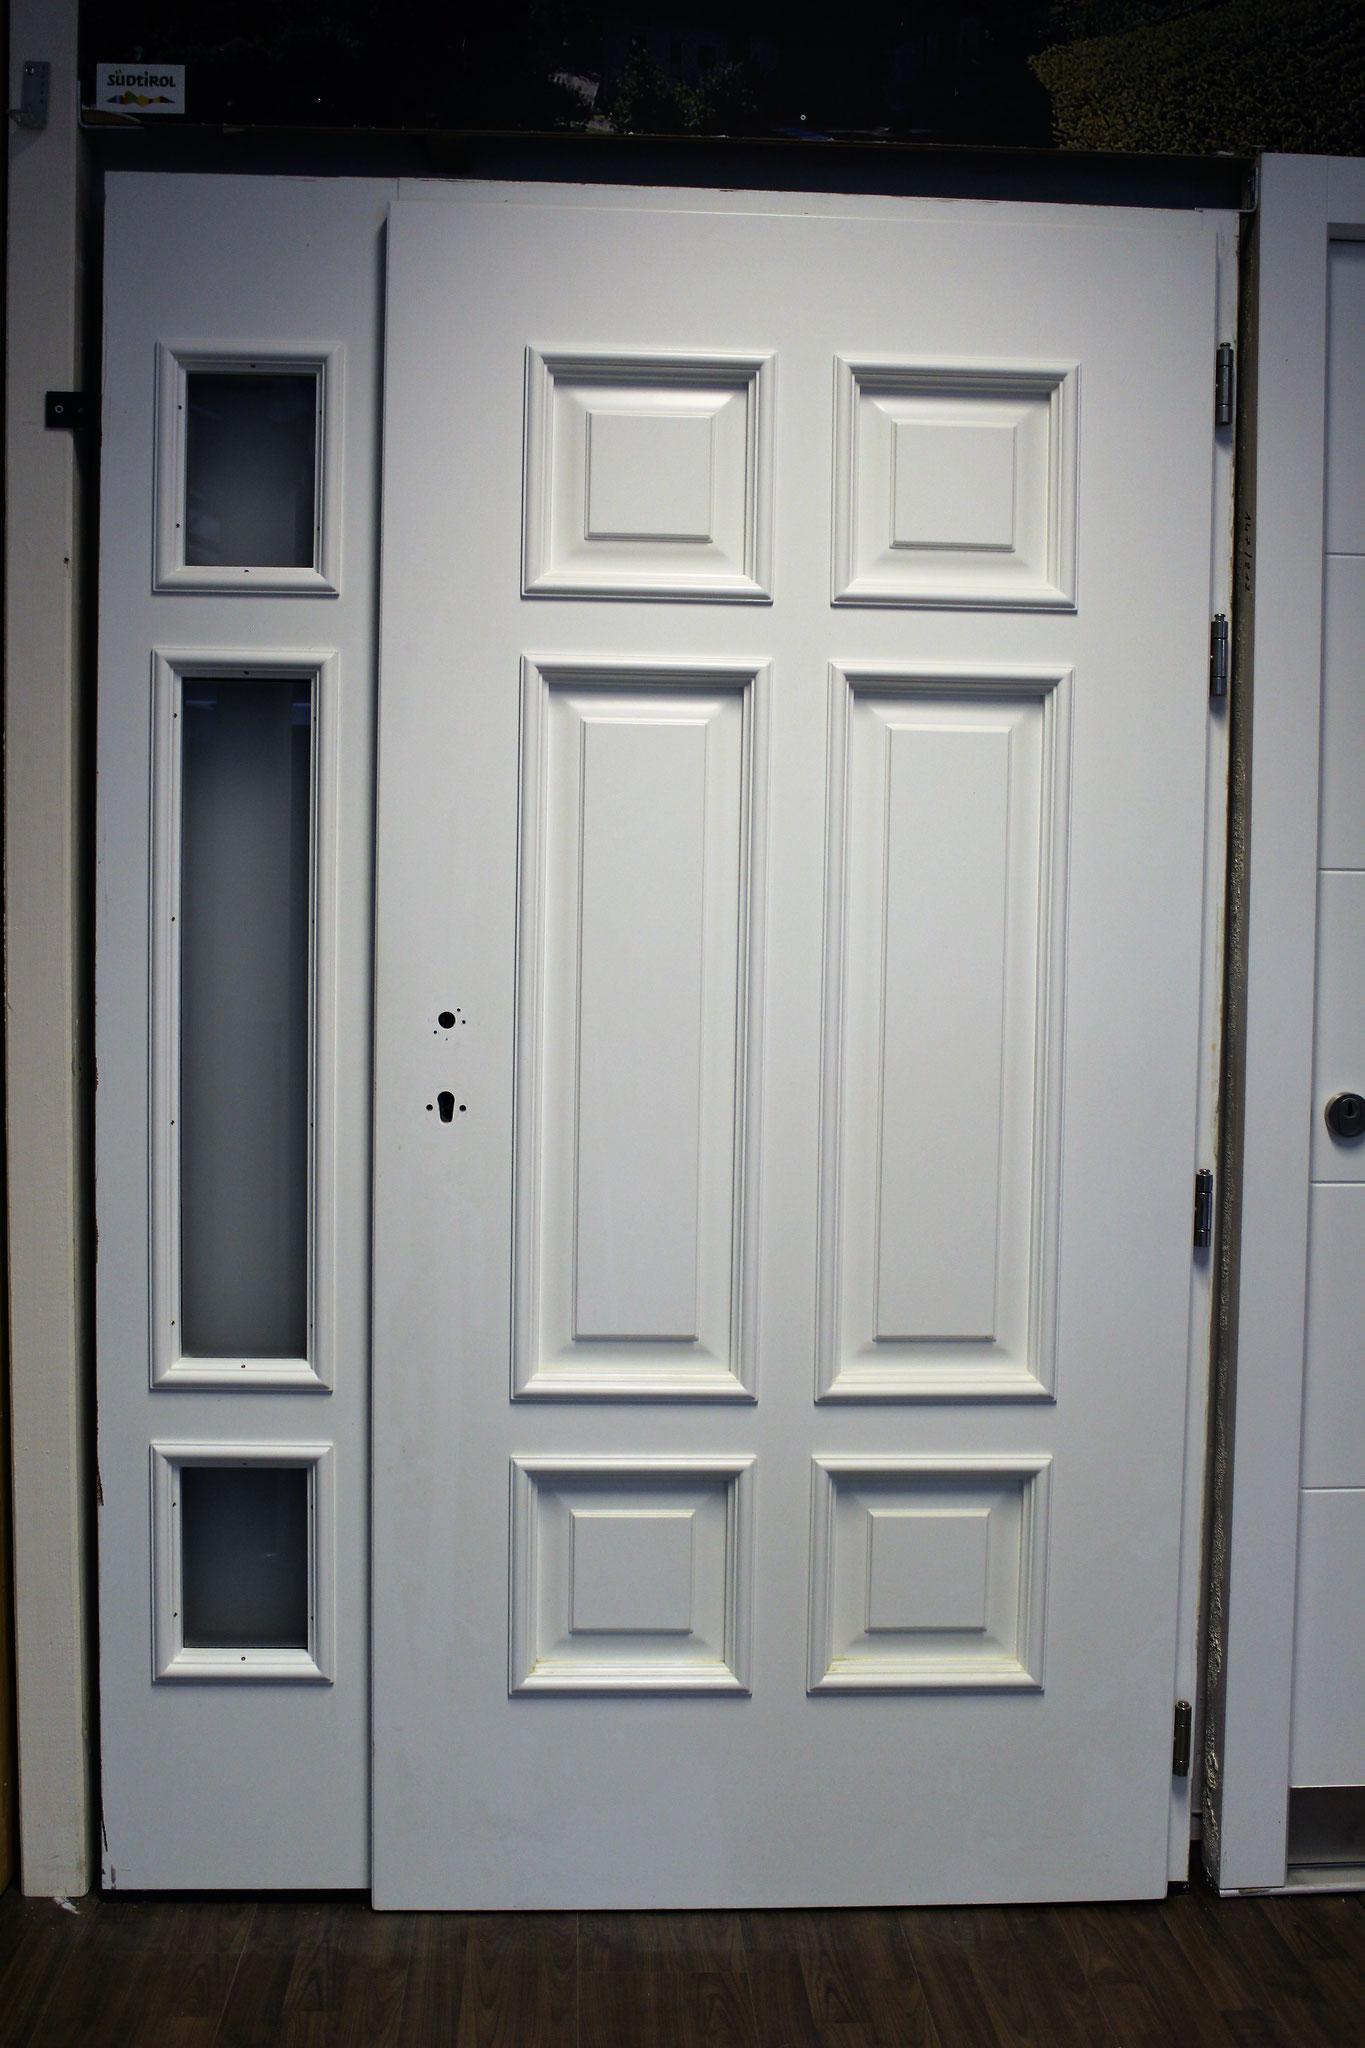 Haustüre 4: 133,5 x 205 cm